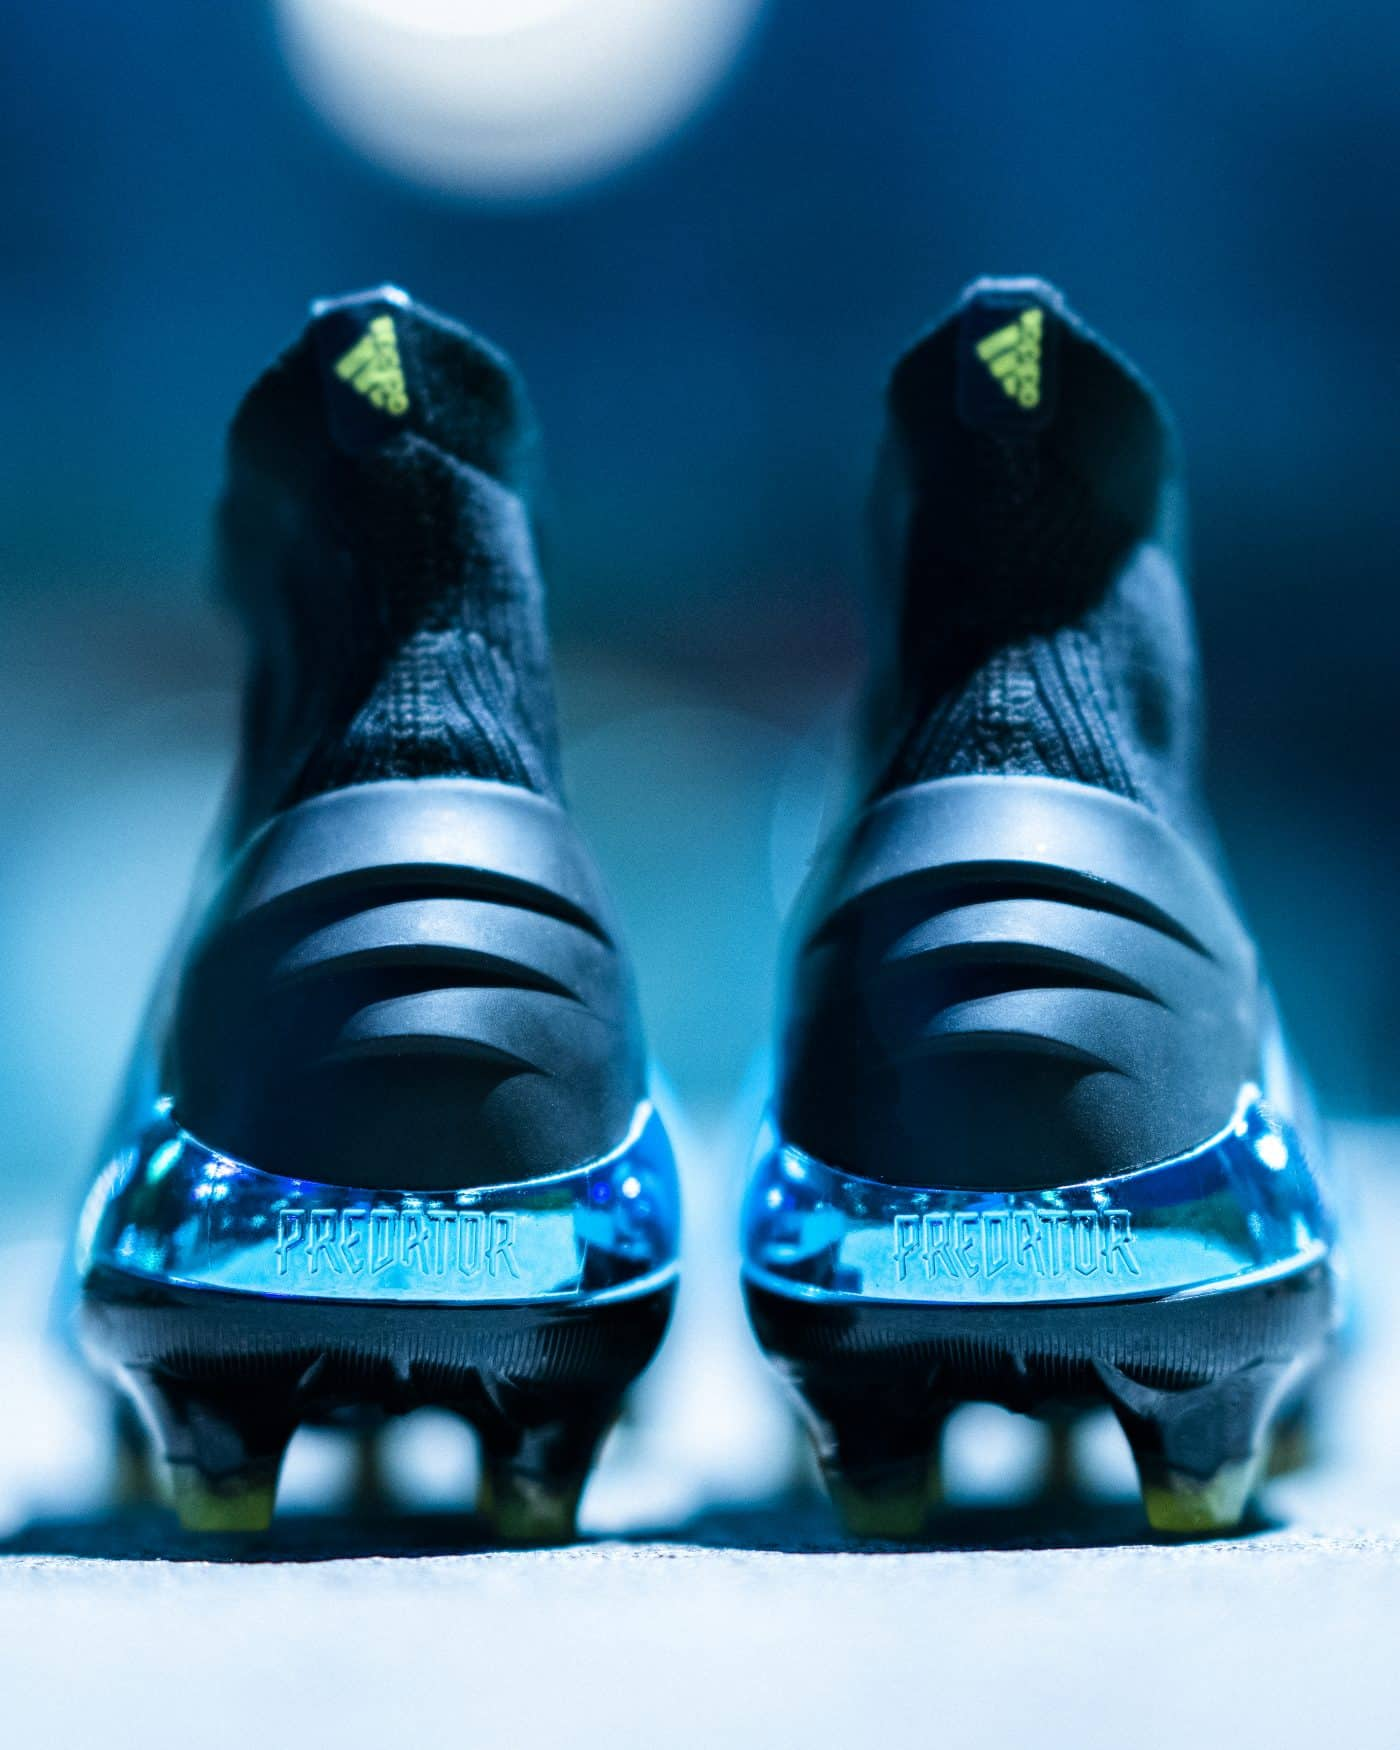 adidas-predator-19-pack-hard-wired-juillet-2019-1